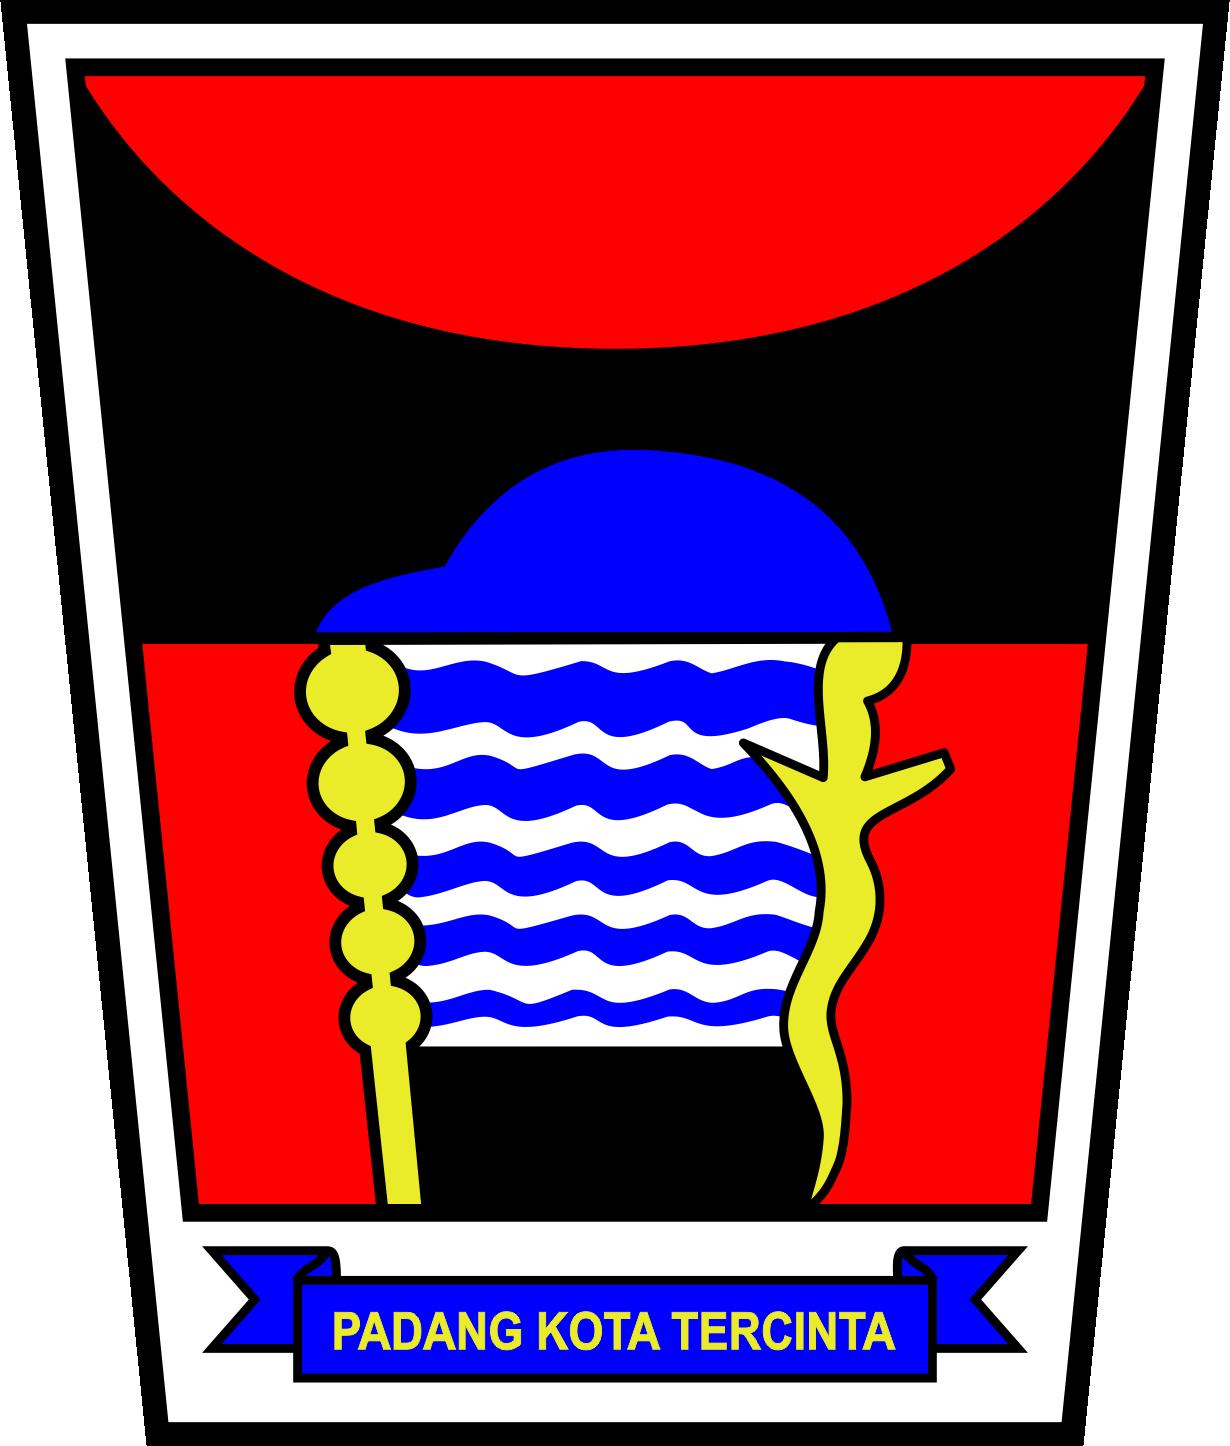 Pin Oleh Zulianto Zulazuli Di Logo Pemerintah